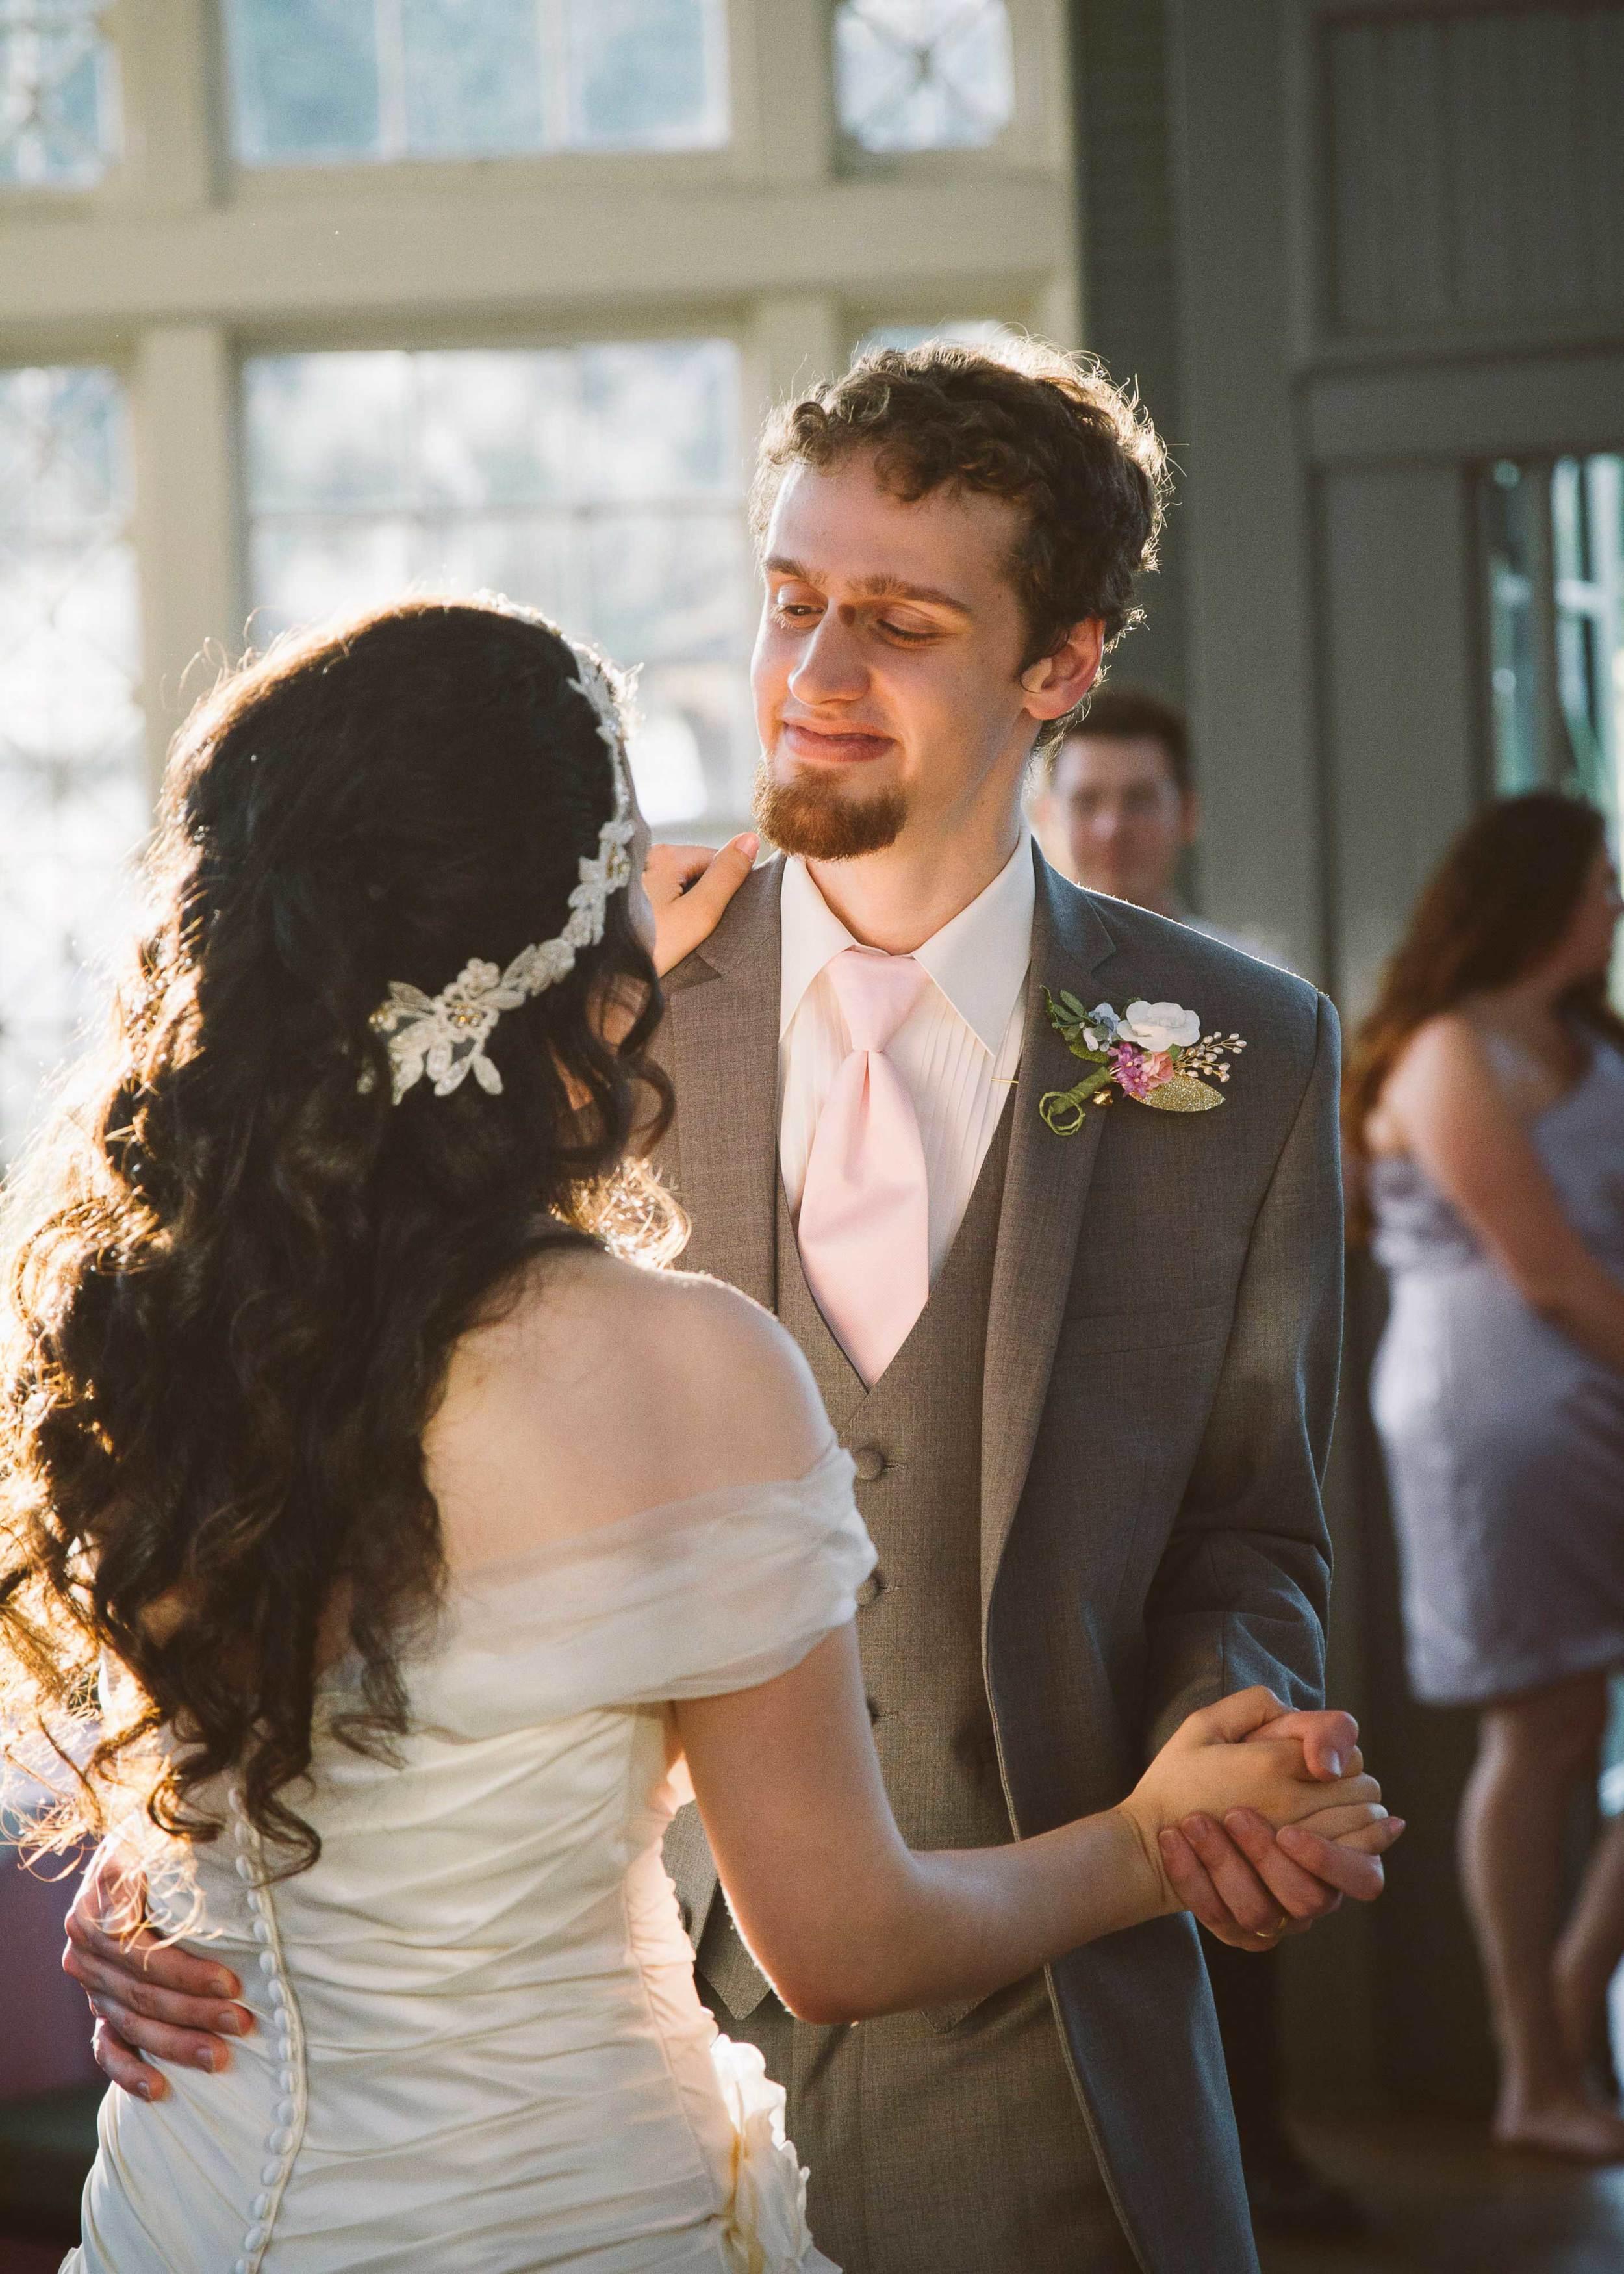 Radka-Wedding-Radka-April-18-2015-0464.jpg